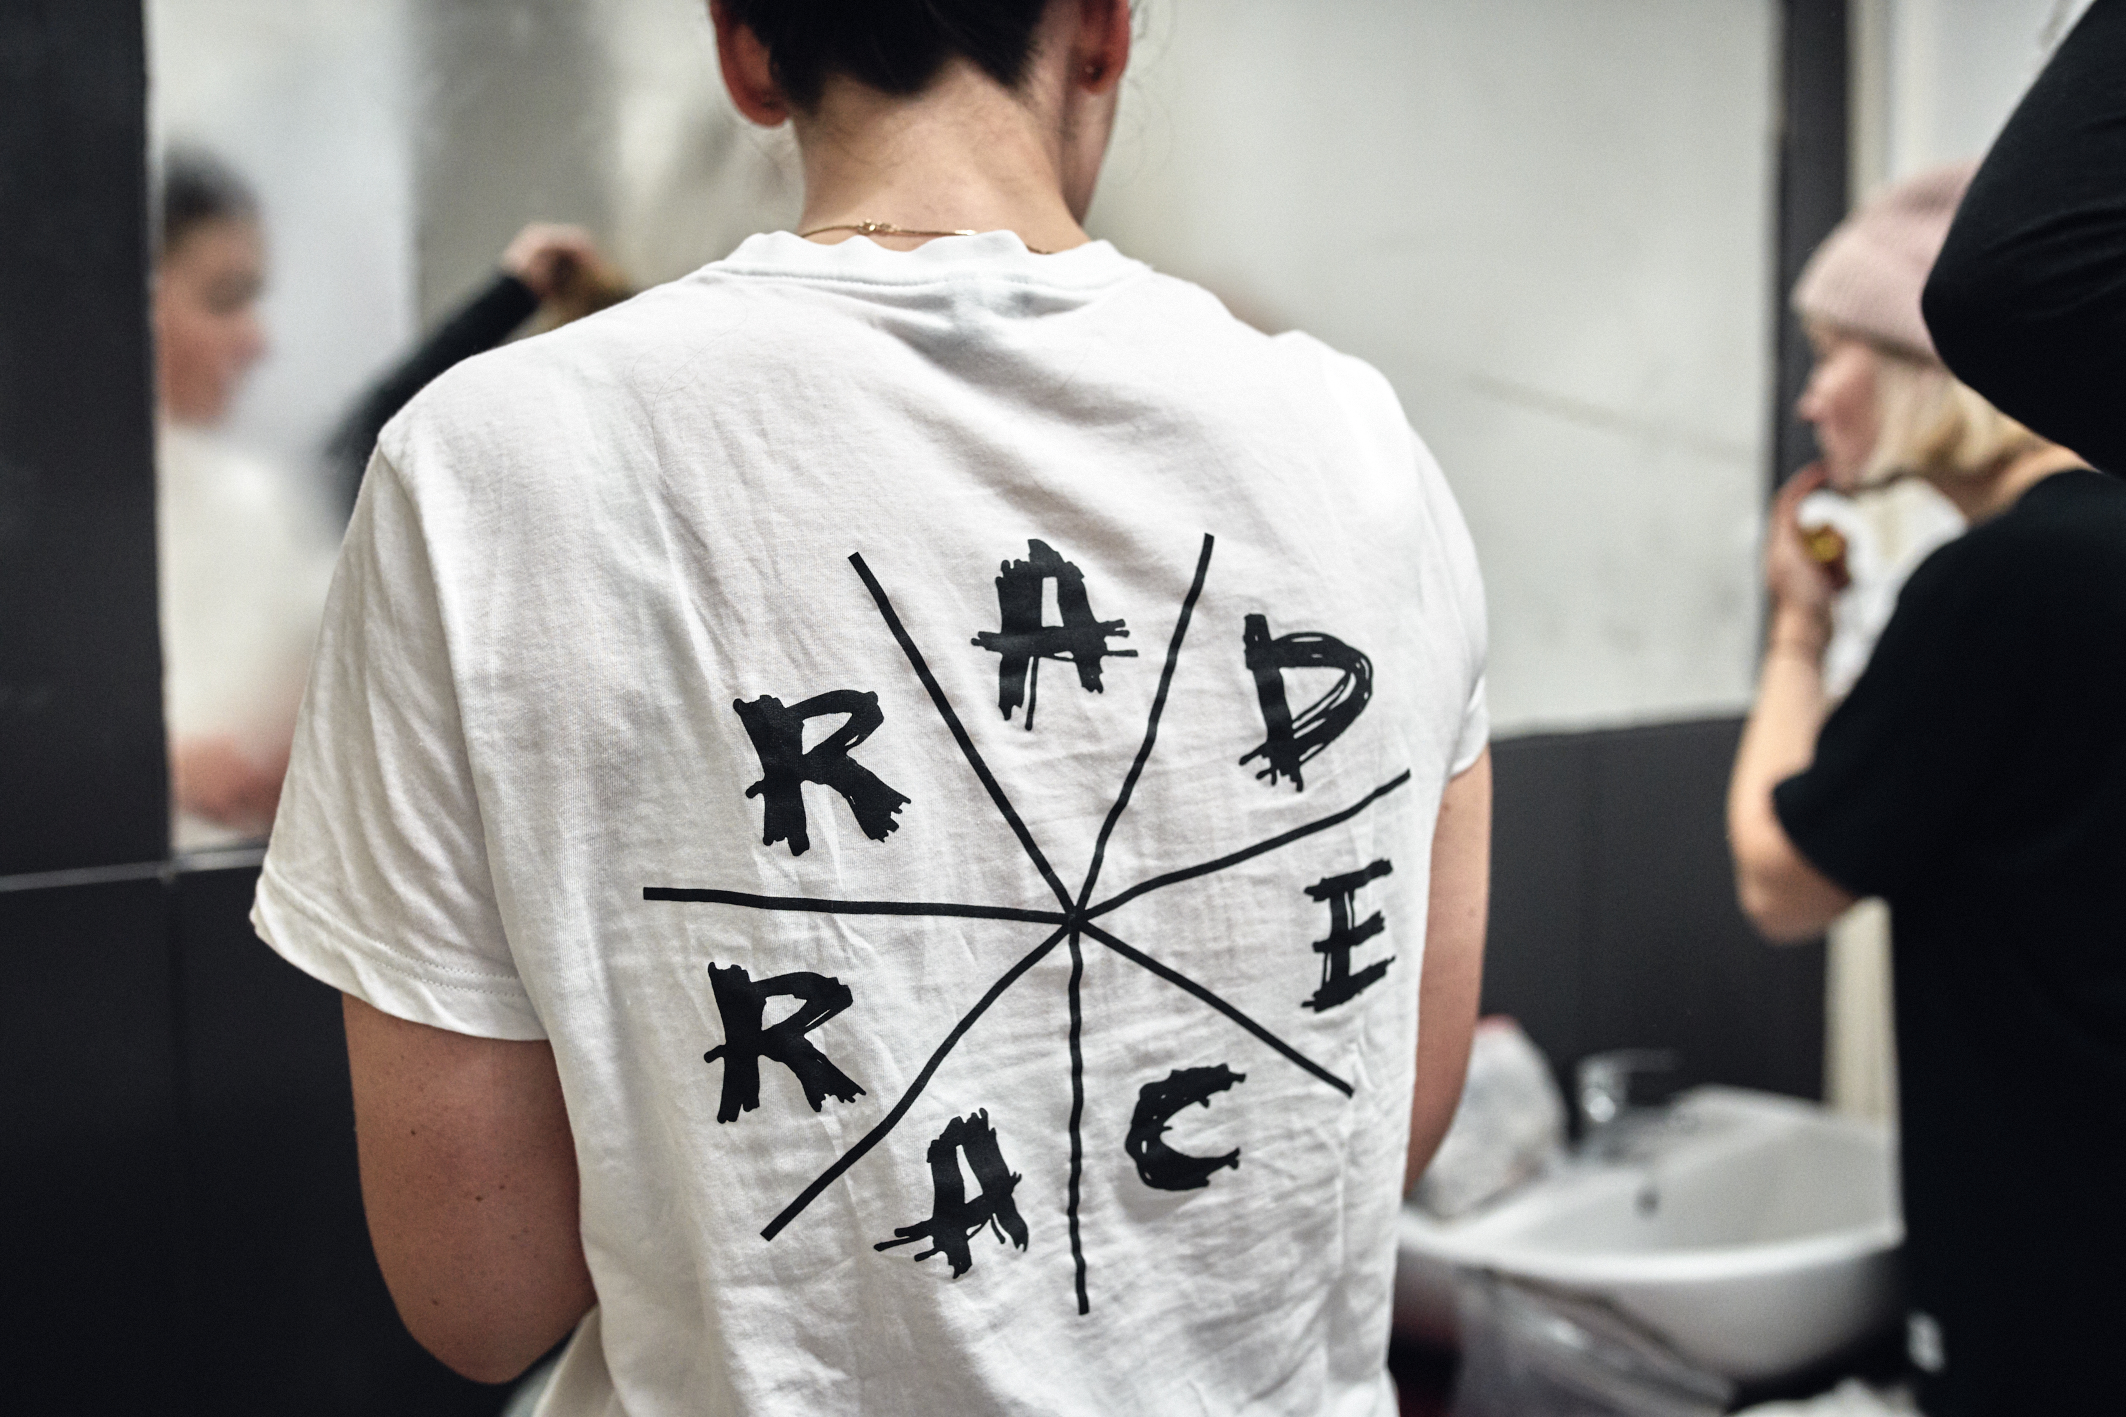 RADRACE_GRLPCK_LIS-VILLE_Bjoern-Reschabek_217.jpg